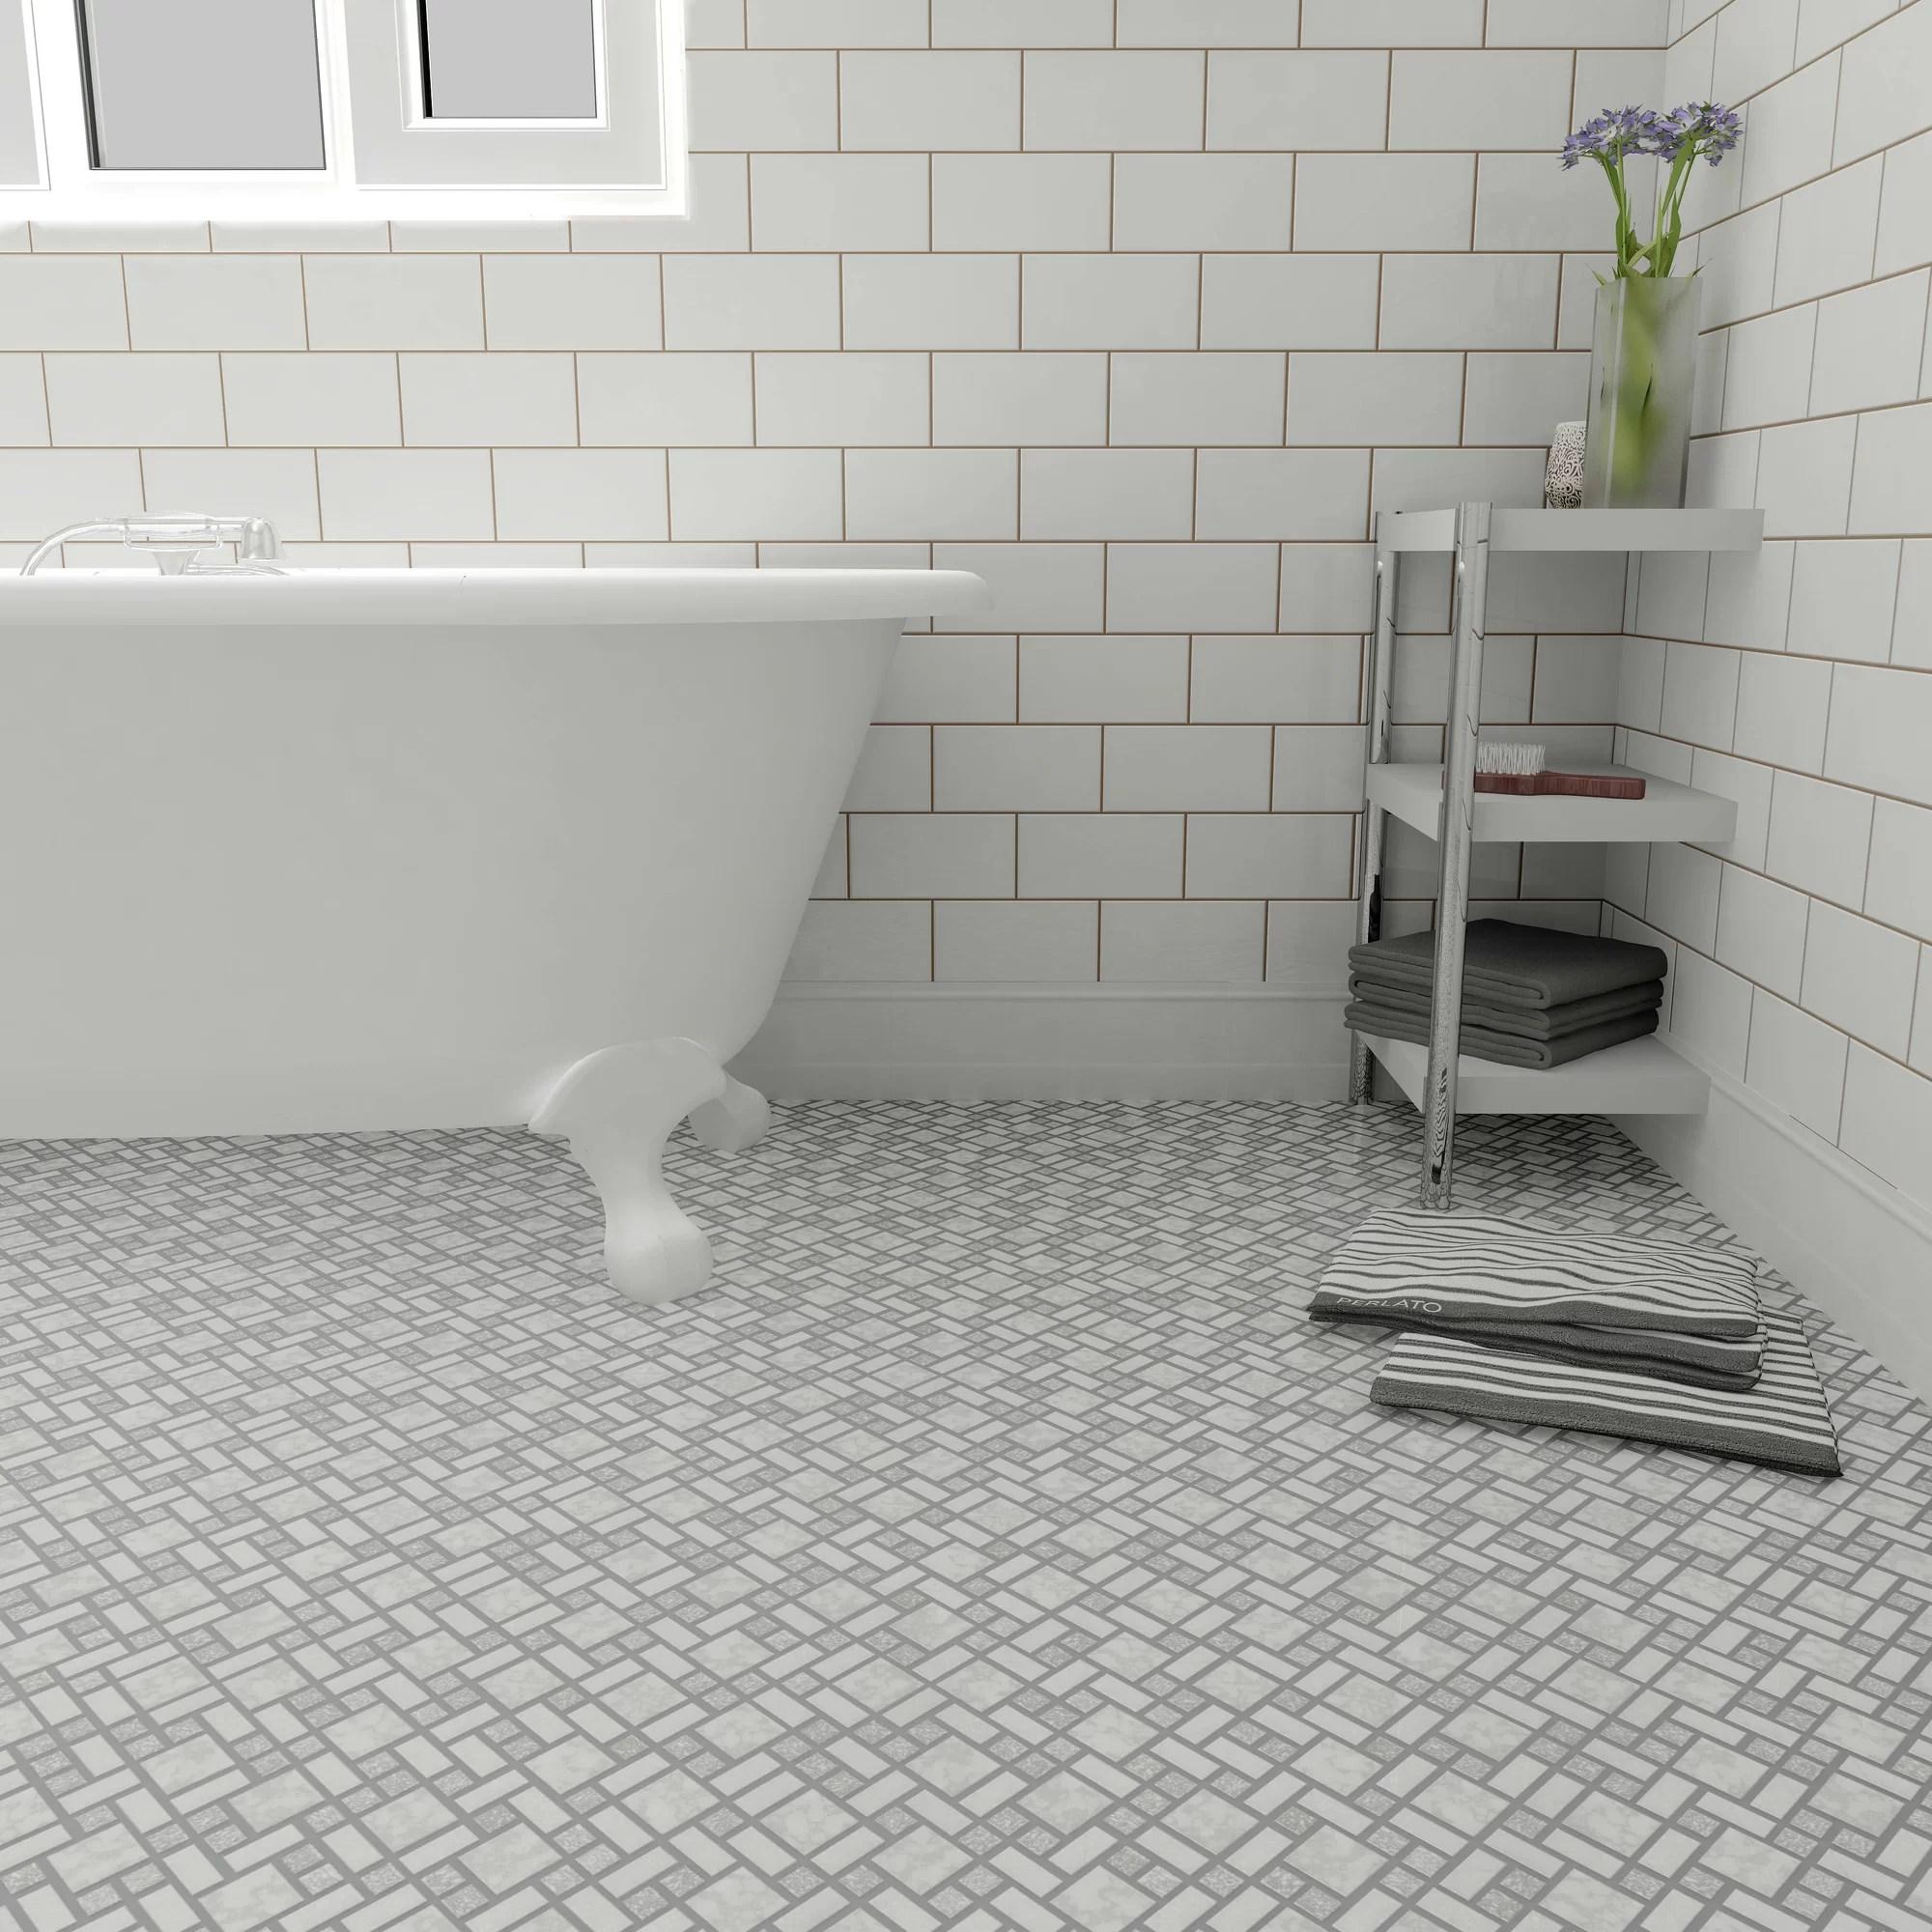 EliteTile Academy Random Sized Porcelain Mosaic Tile In